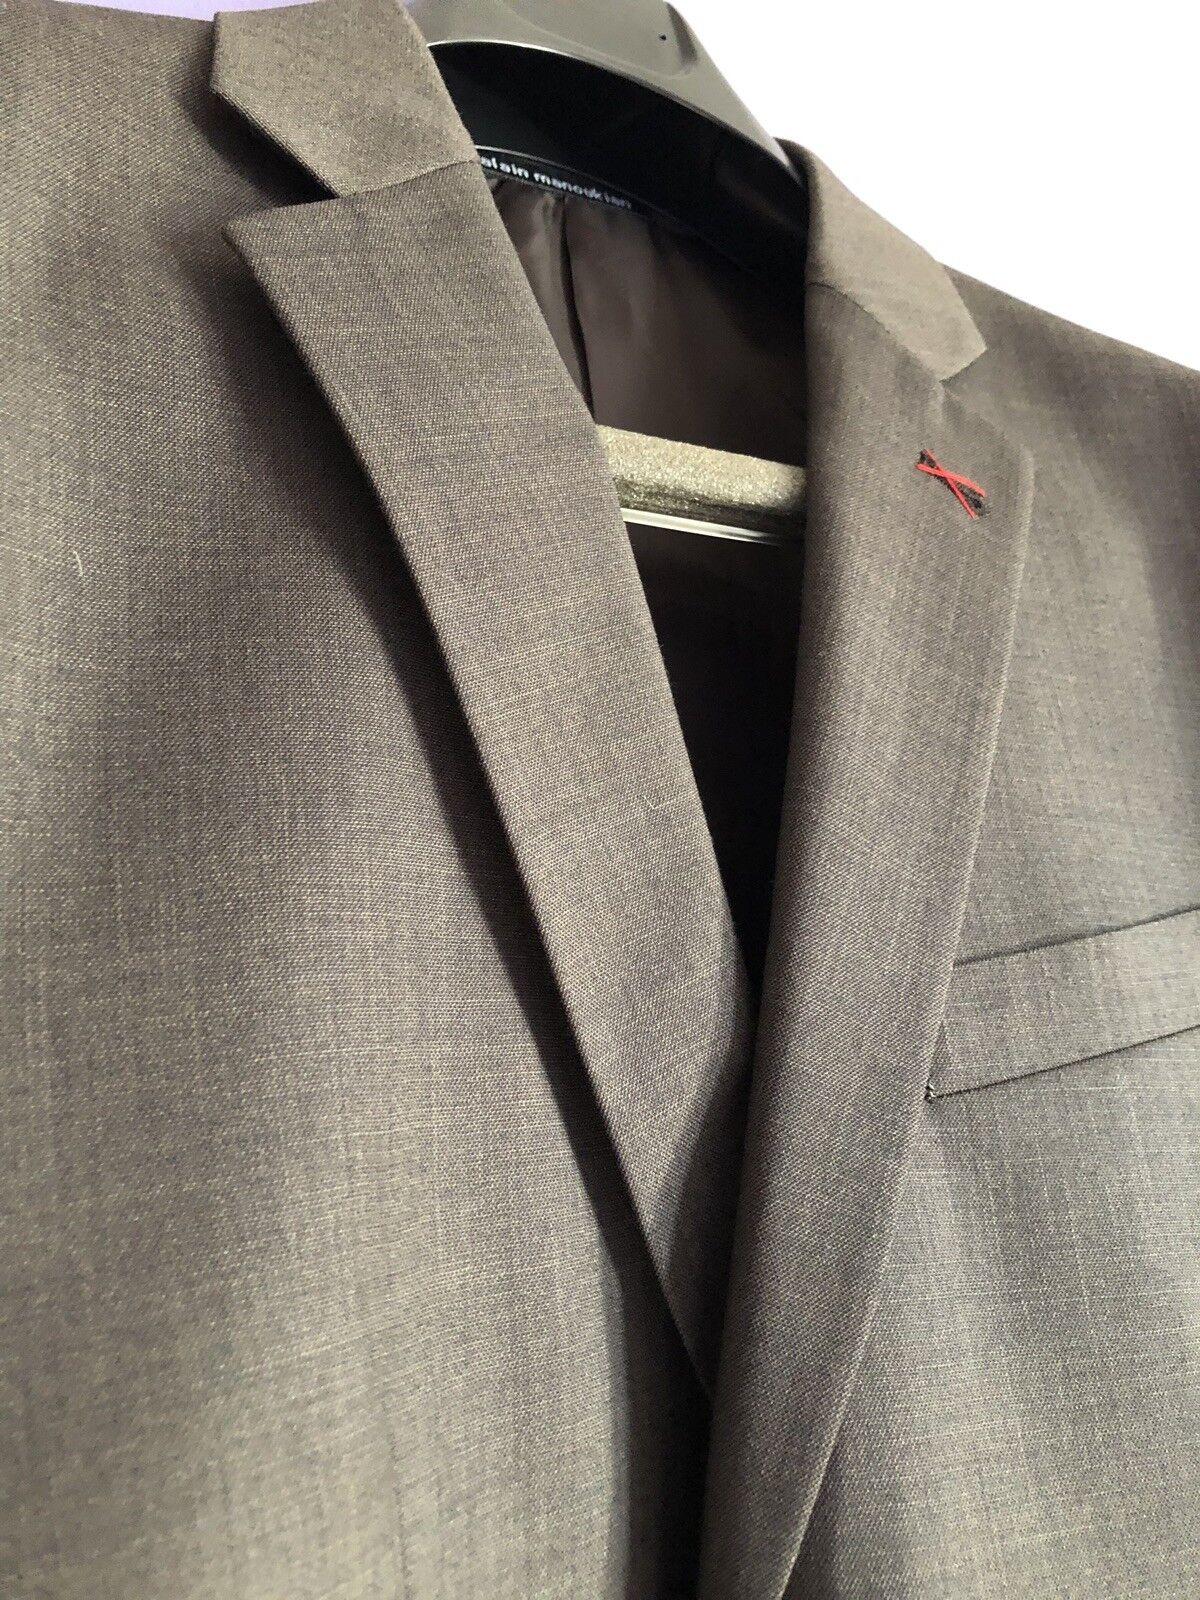 Alain Manoukian Men's Blazer Size52Eur 44R US